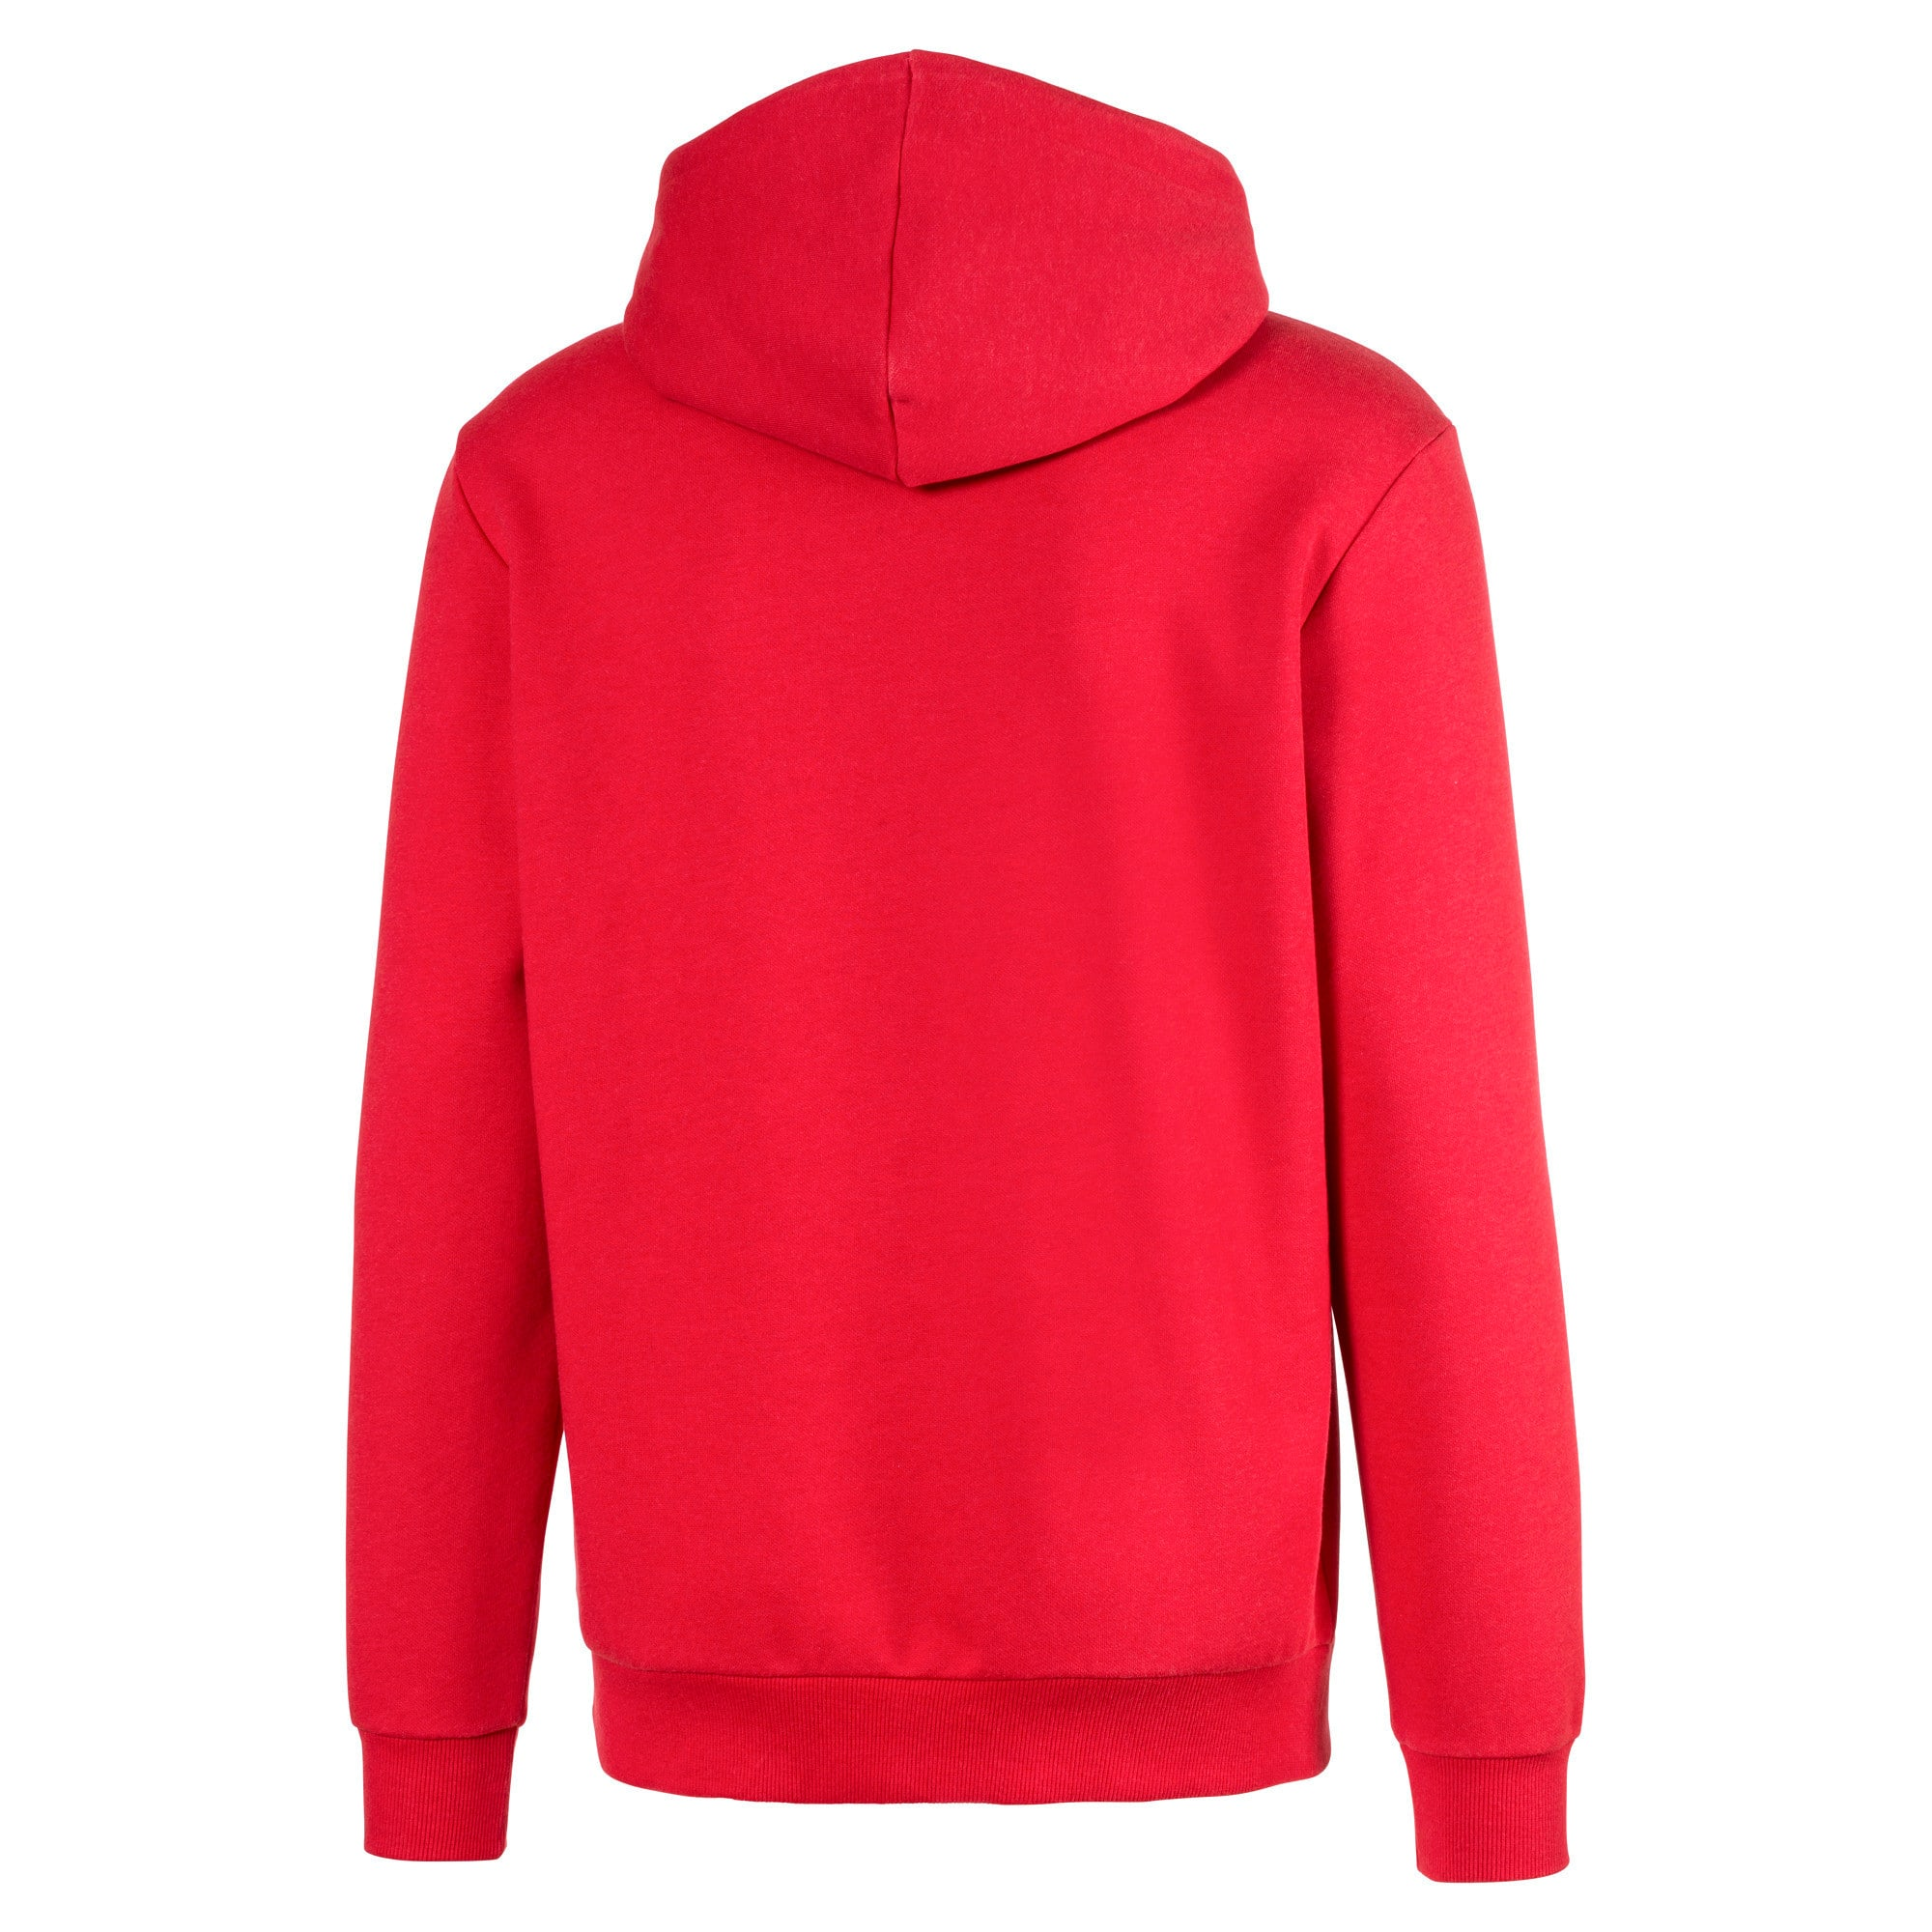 Thumbnail 5 of Essentials Fleece Men's Hoodie, High Risk Red Heather, medium